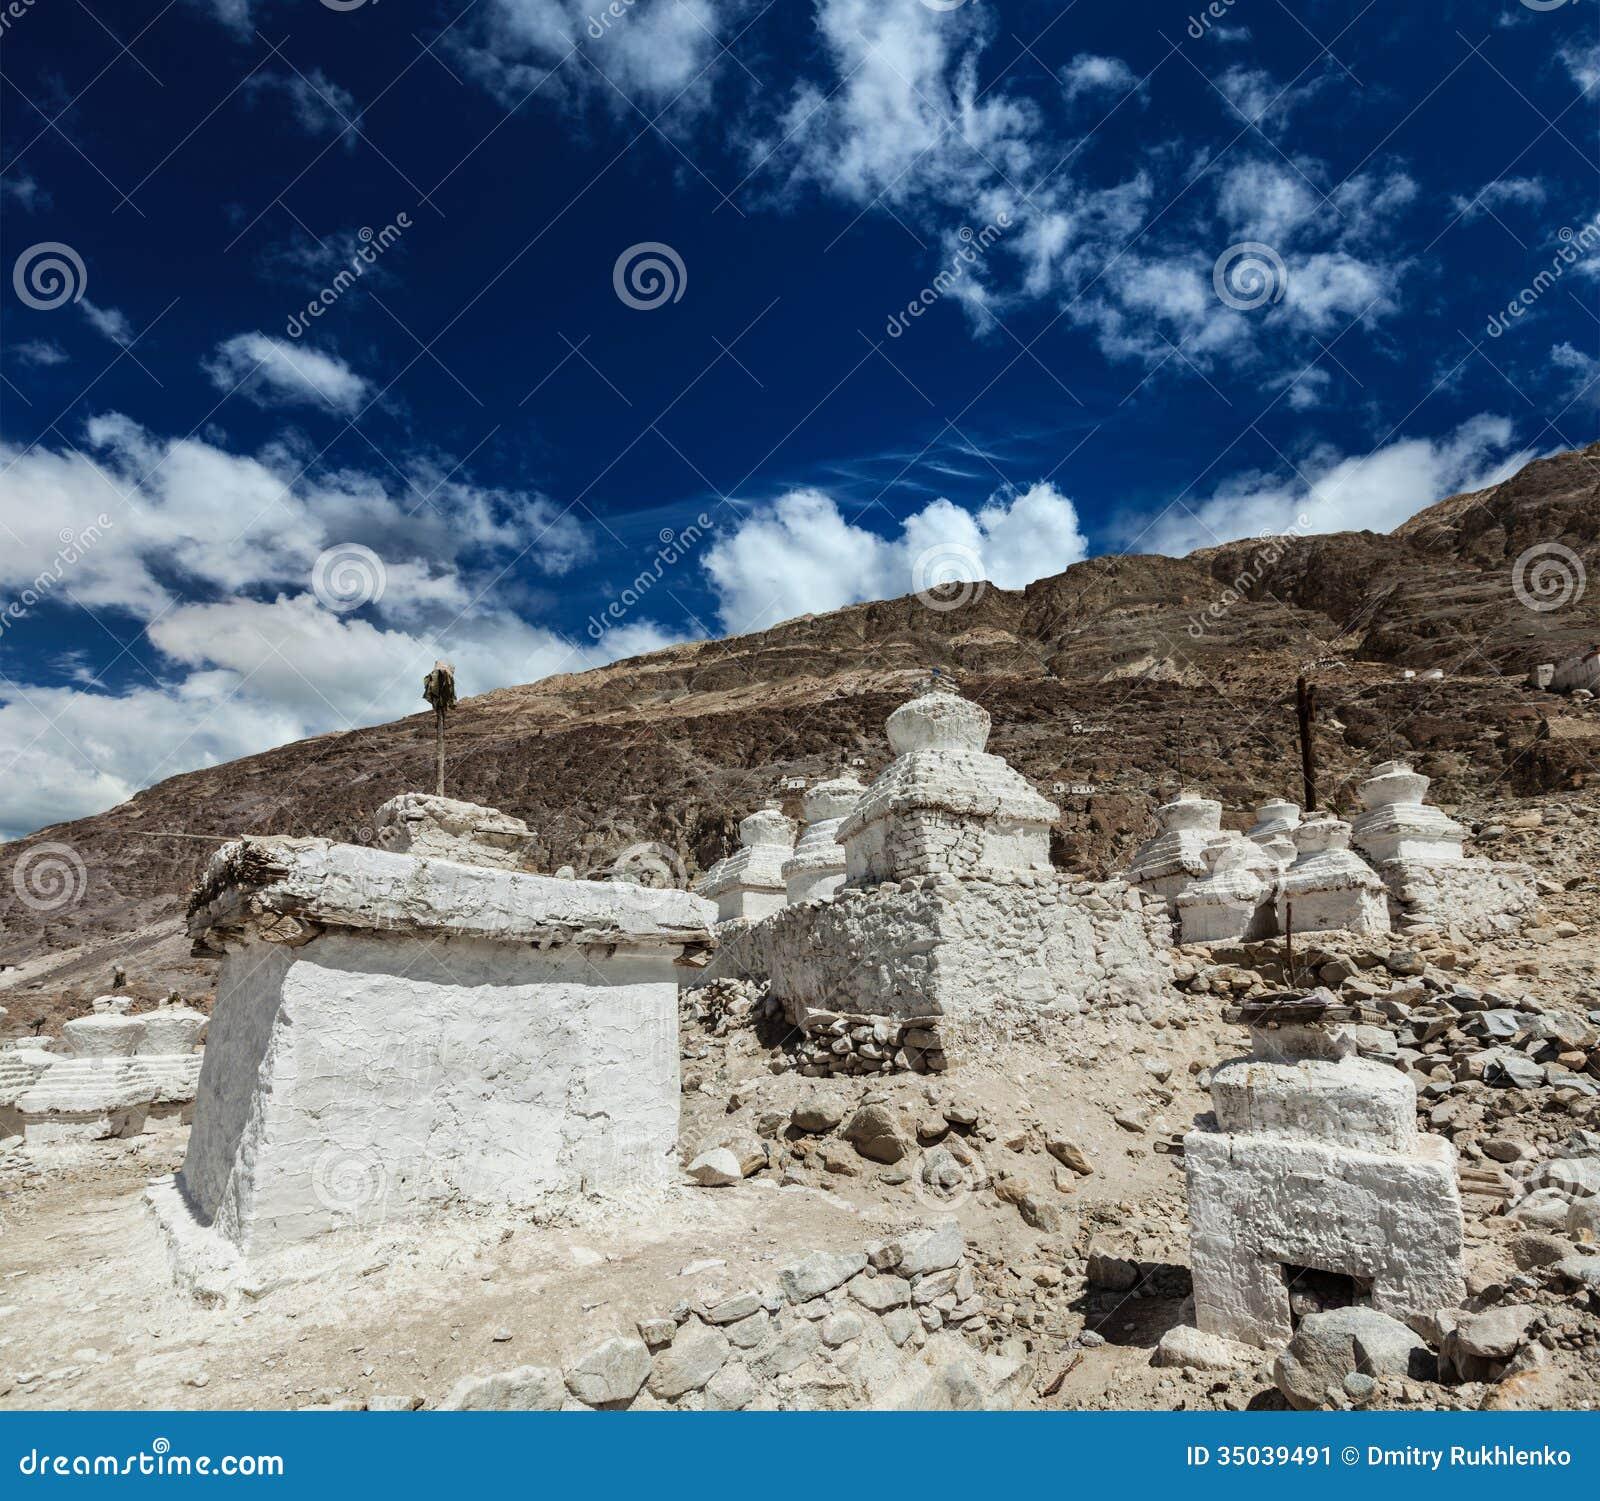 el valle buddhist singles Found 25 results for the search del valle : 344 el valle loop, san patricio, nm 88348 | id: 119816 | homefindercom - 344 el valle loop, san patricio, nm 88348, santa isabel - urb valle costero - tremenda oportunidad santa isabel - santa isabel - urb valle costero - tremenda oportunidad, 1618 valle verde dr, brentwood.